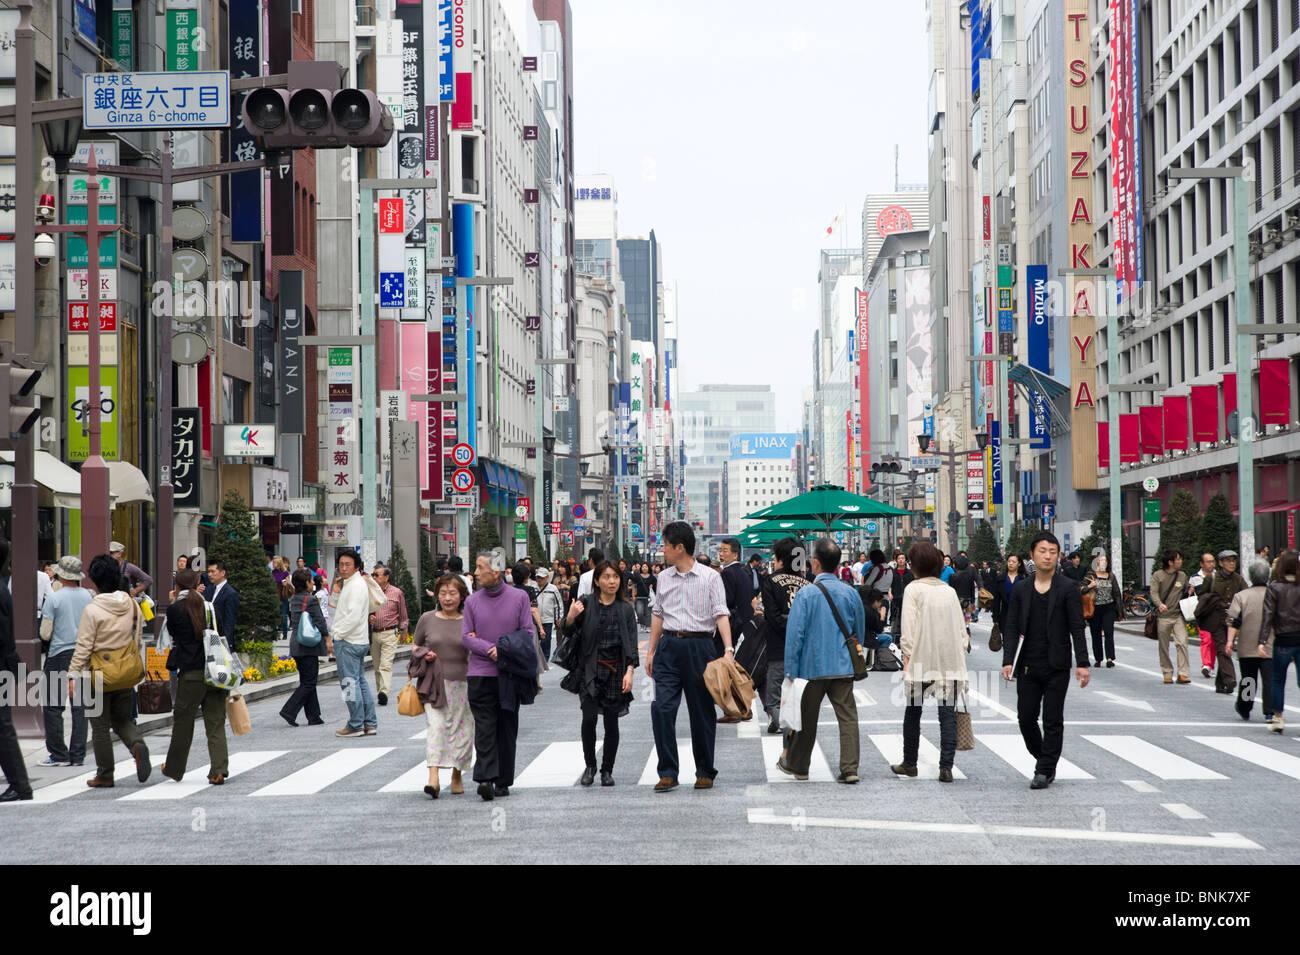 Chuo-dori in Ginza 4-chome, Tokyo, Japan Stock Photo